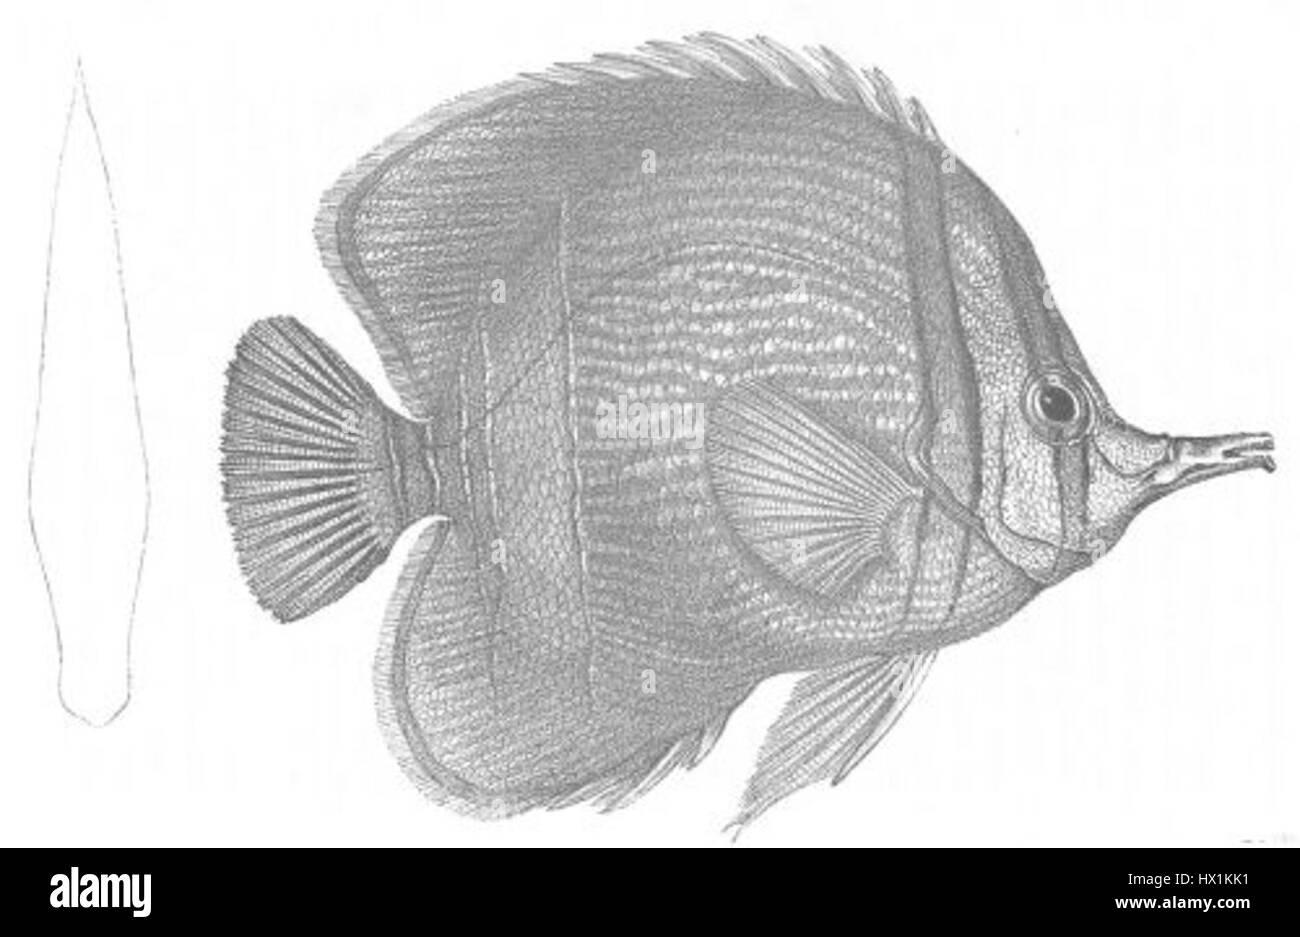 Chelmon marginalis (Discoveries in Australia) - Stock Image